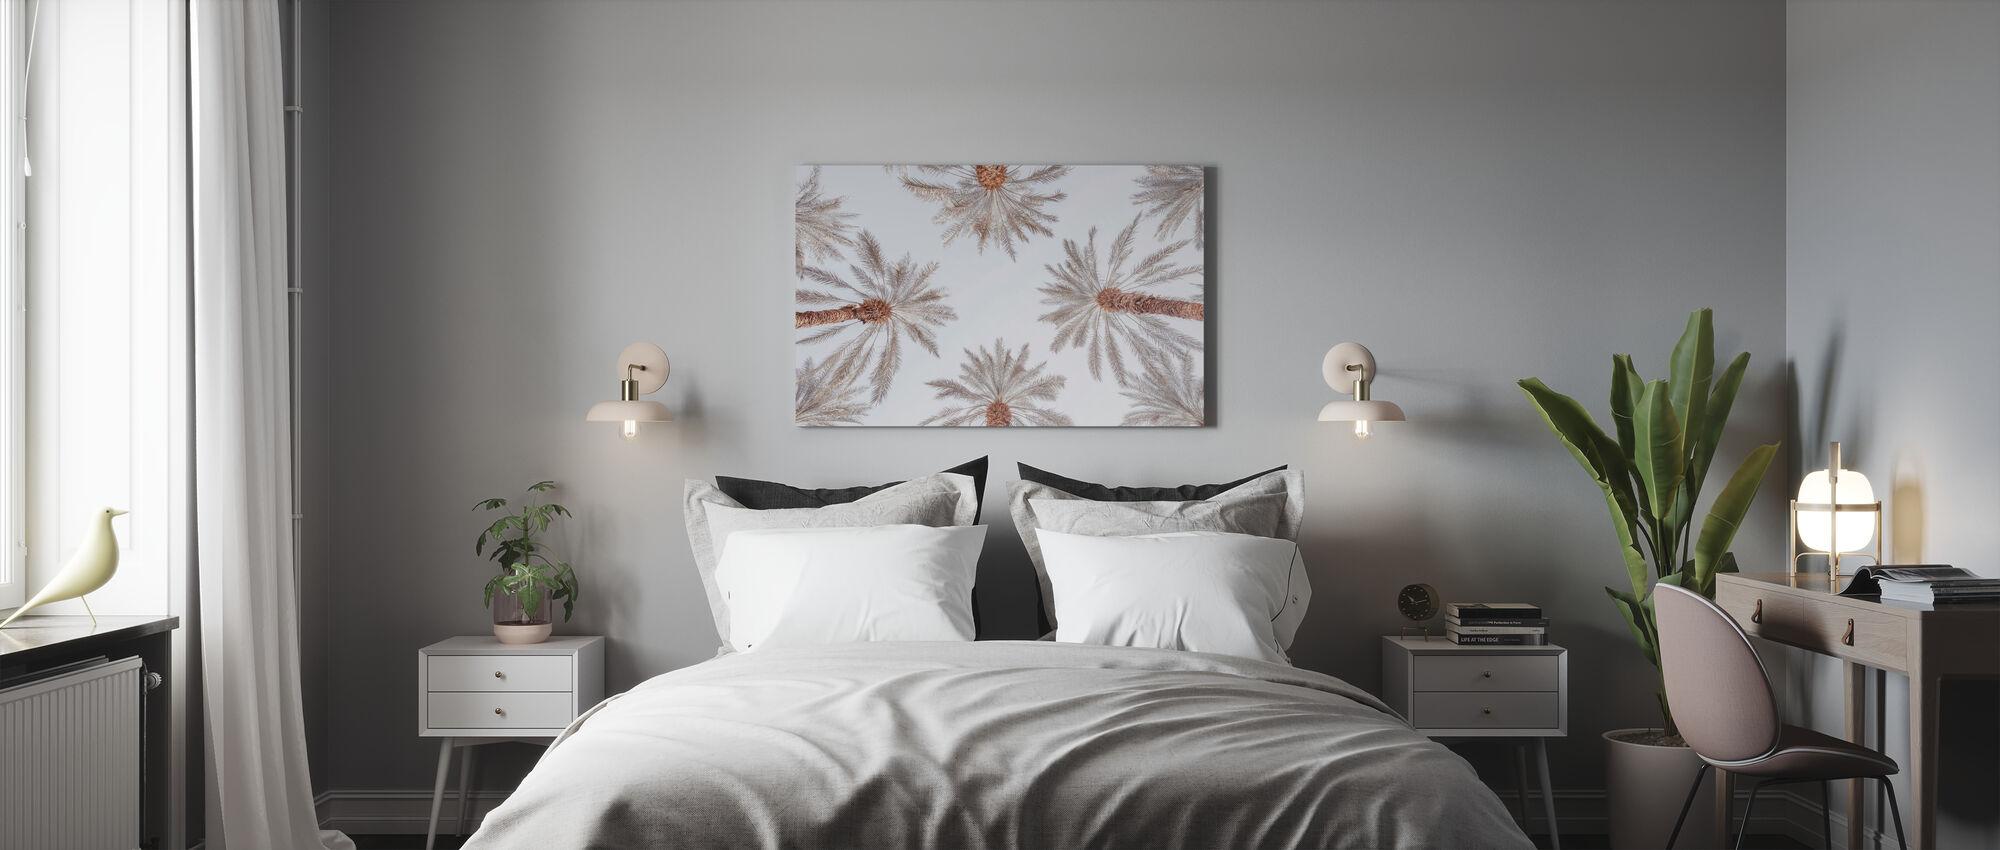 Beneath the Palm Trees - Canvas print - Bedroom